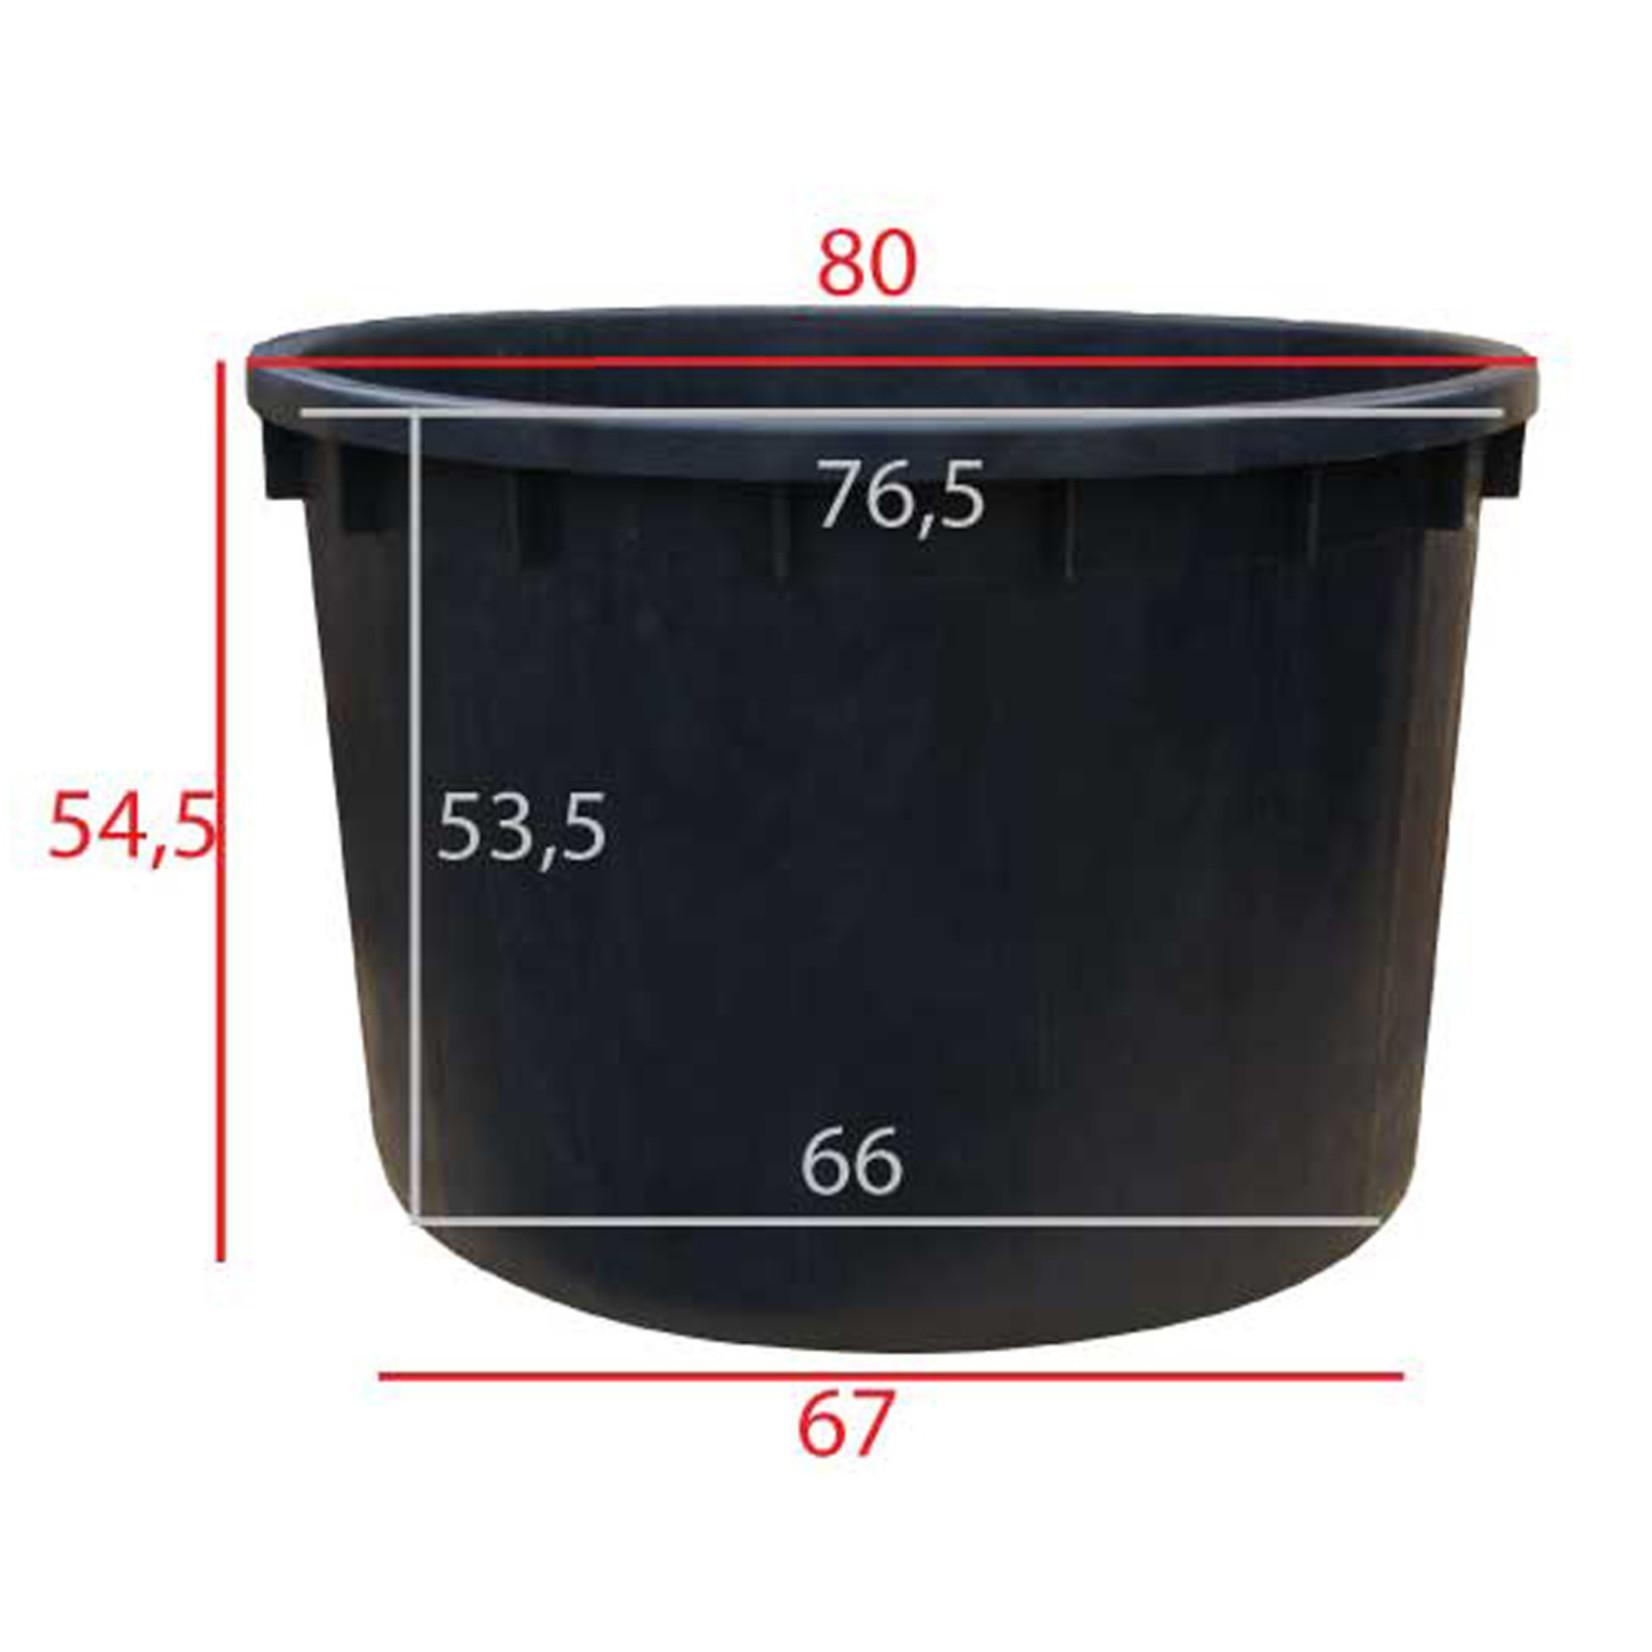 Boomkuip 210 liter Ø 80 x h.55 cm